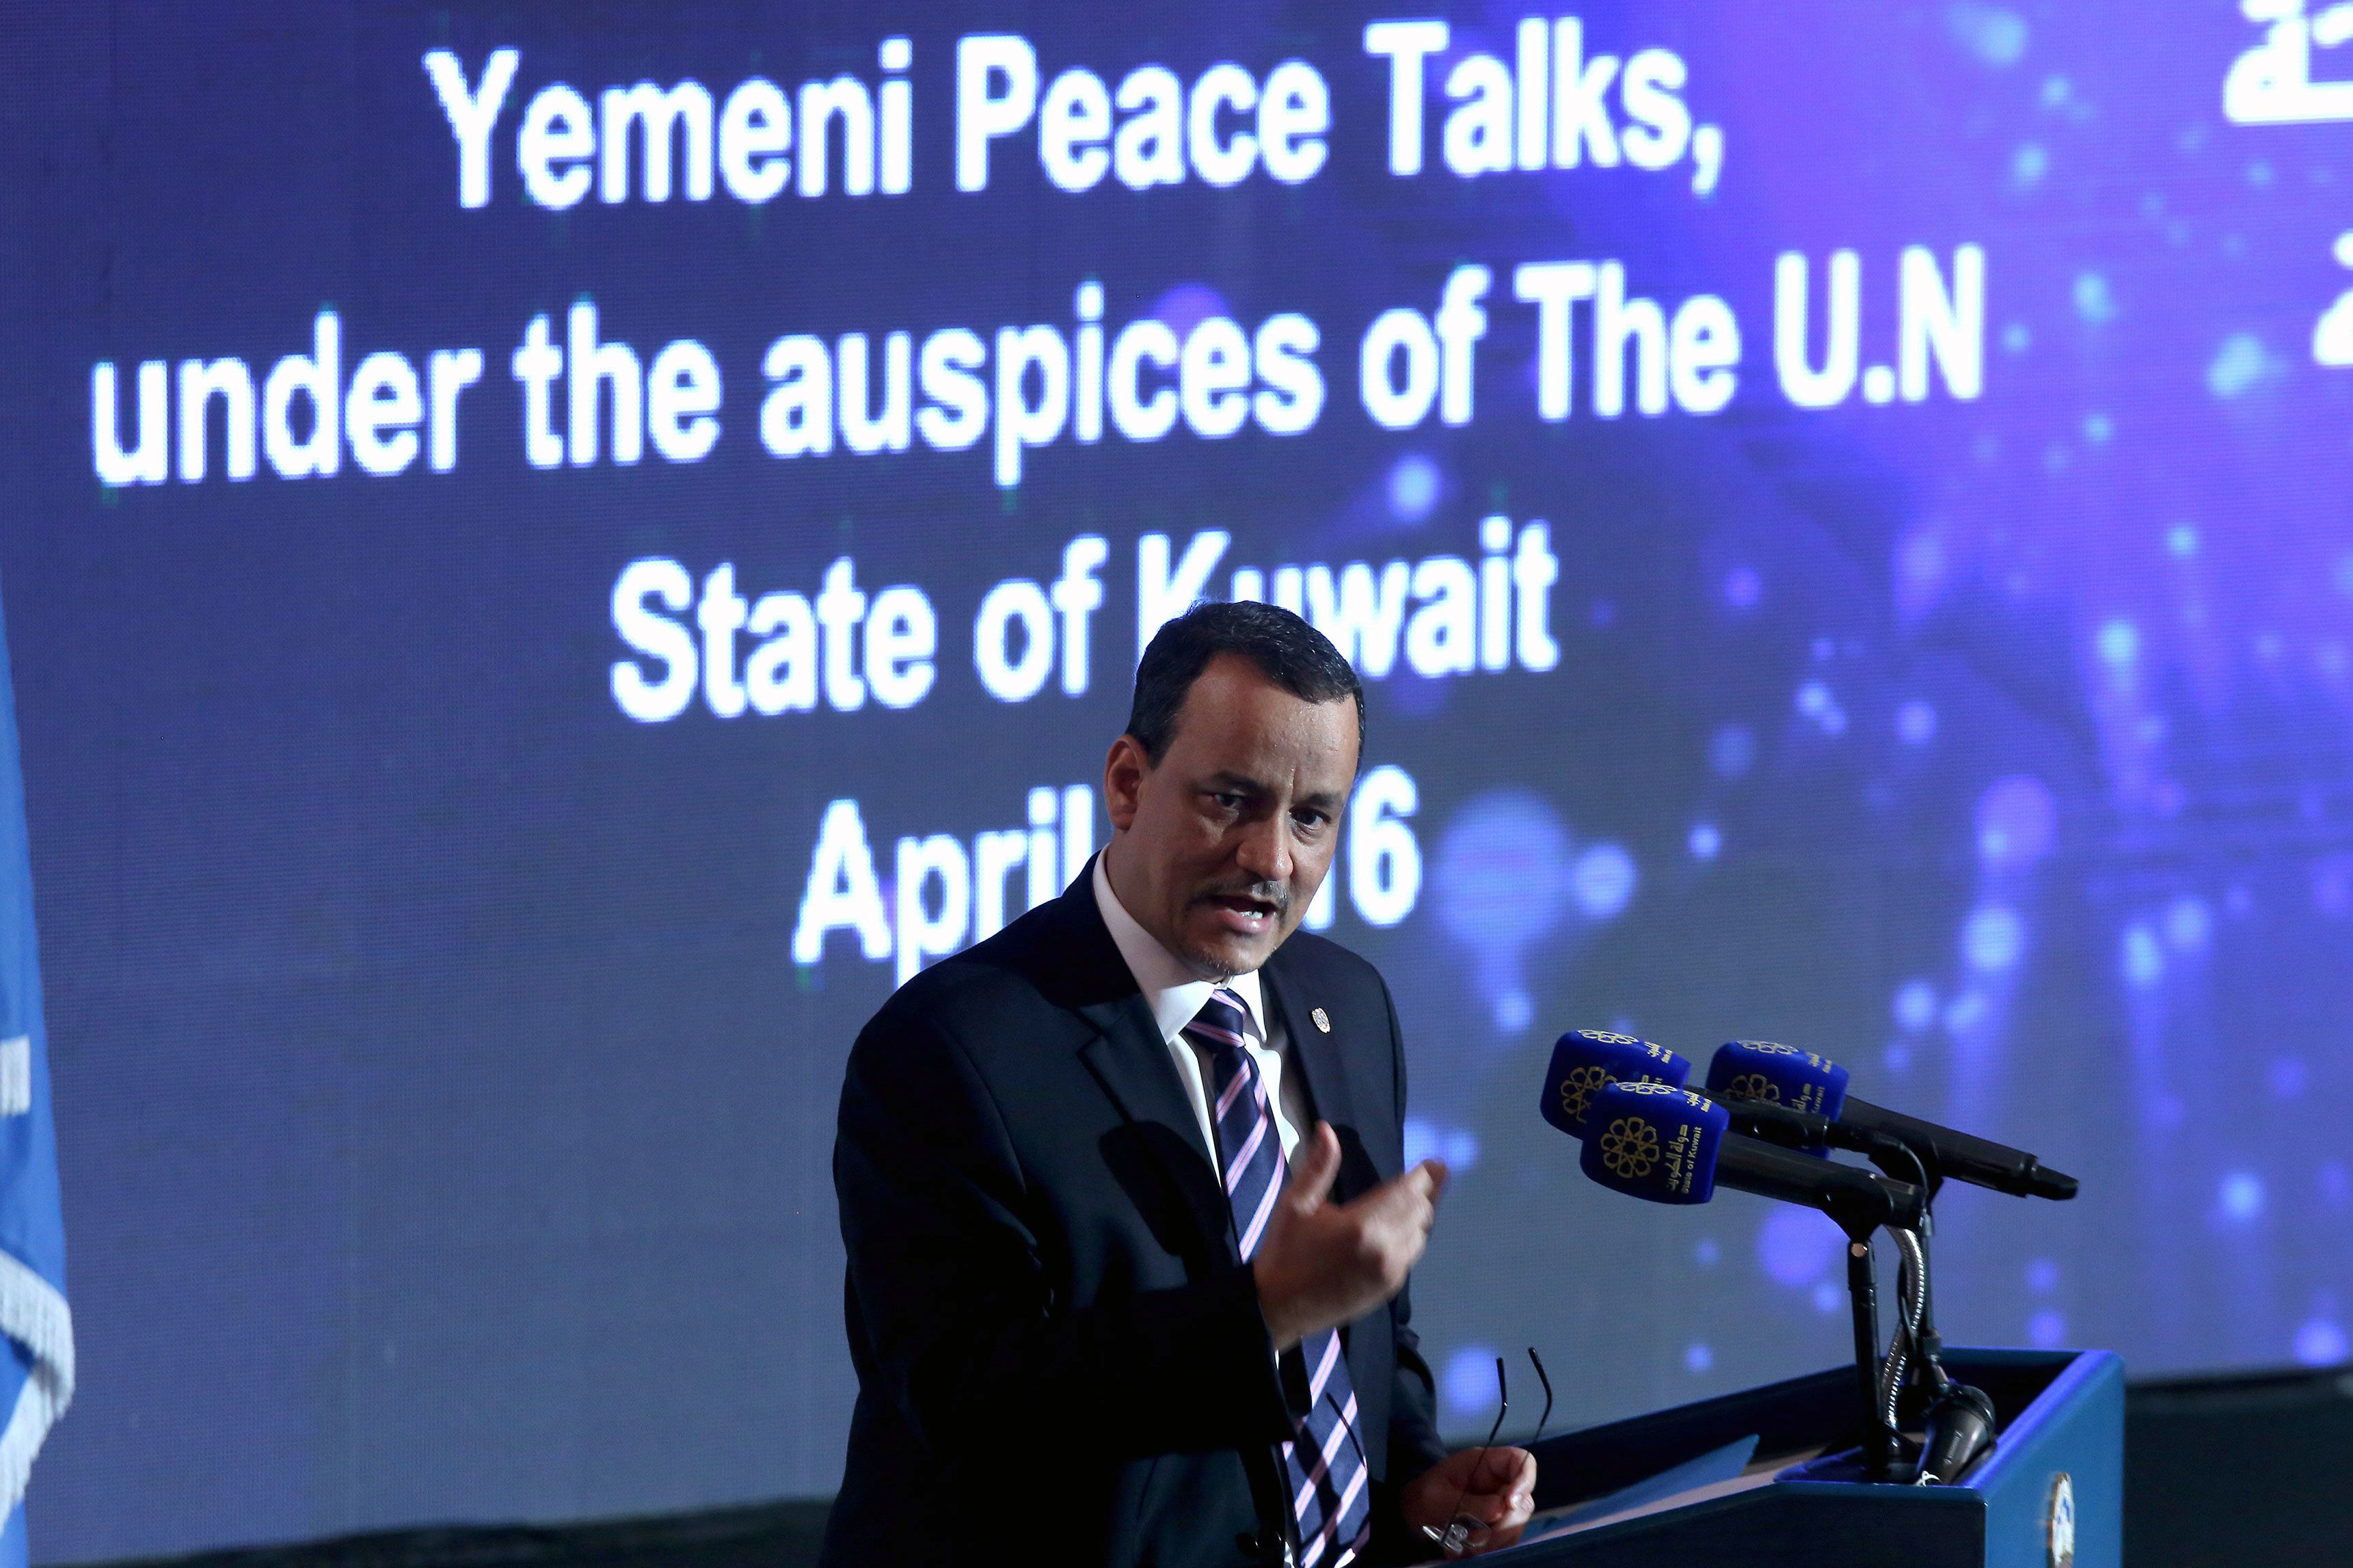 Militants exploit chaos in Yemen as warring parties pursue peace